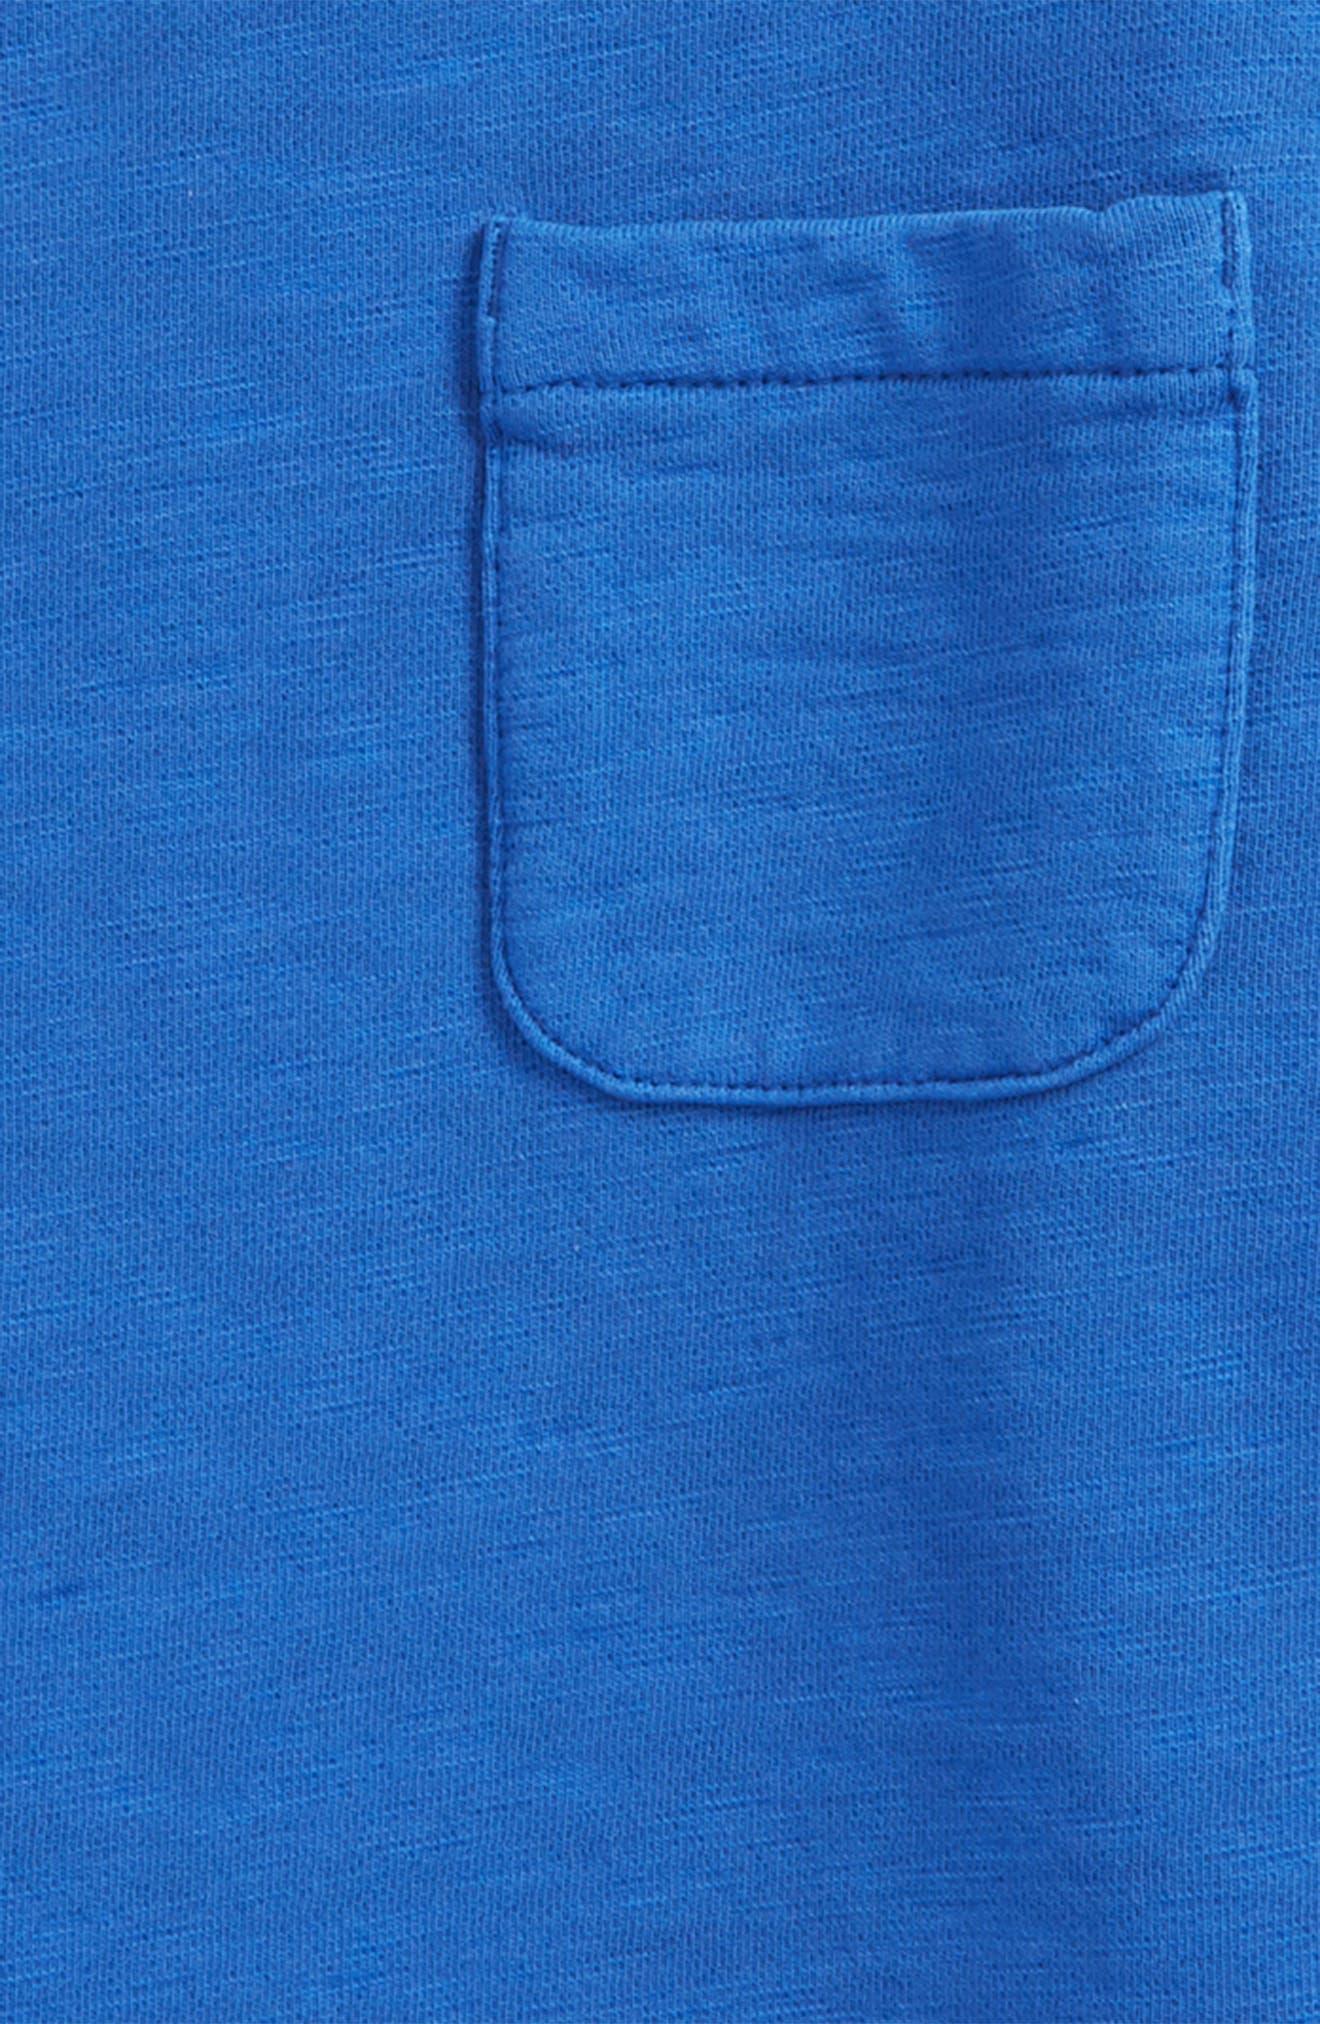 Alternate Image 2  - Mini Boden Pocket Crewneck Sweatshirt (Toddler Boys, Little Boys & Big Boys)